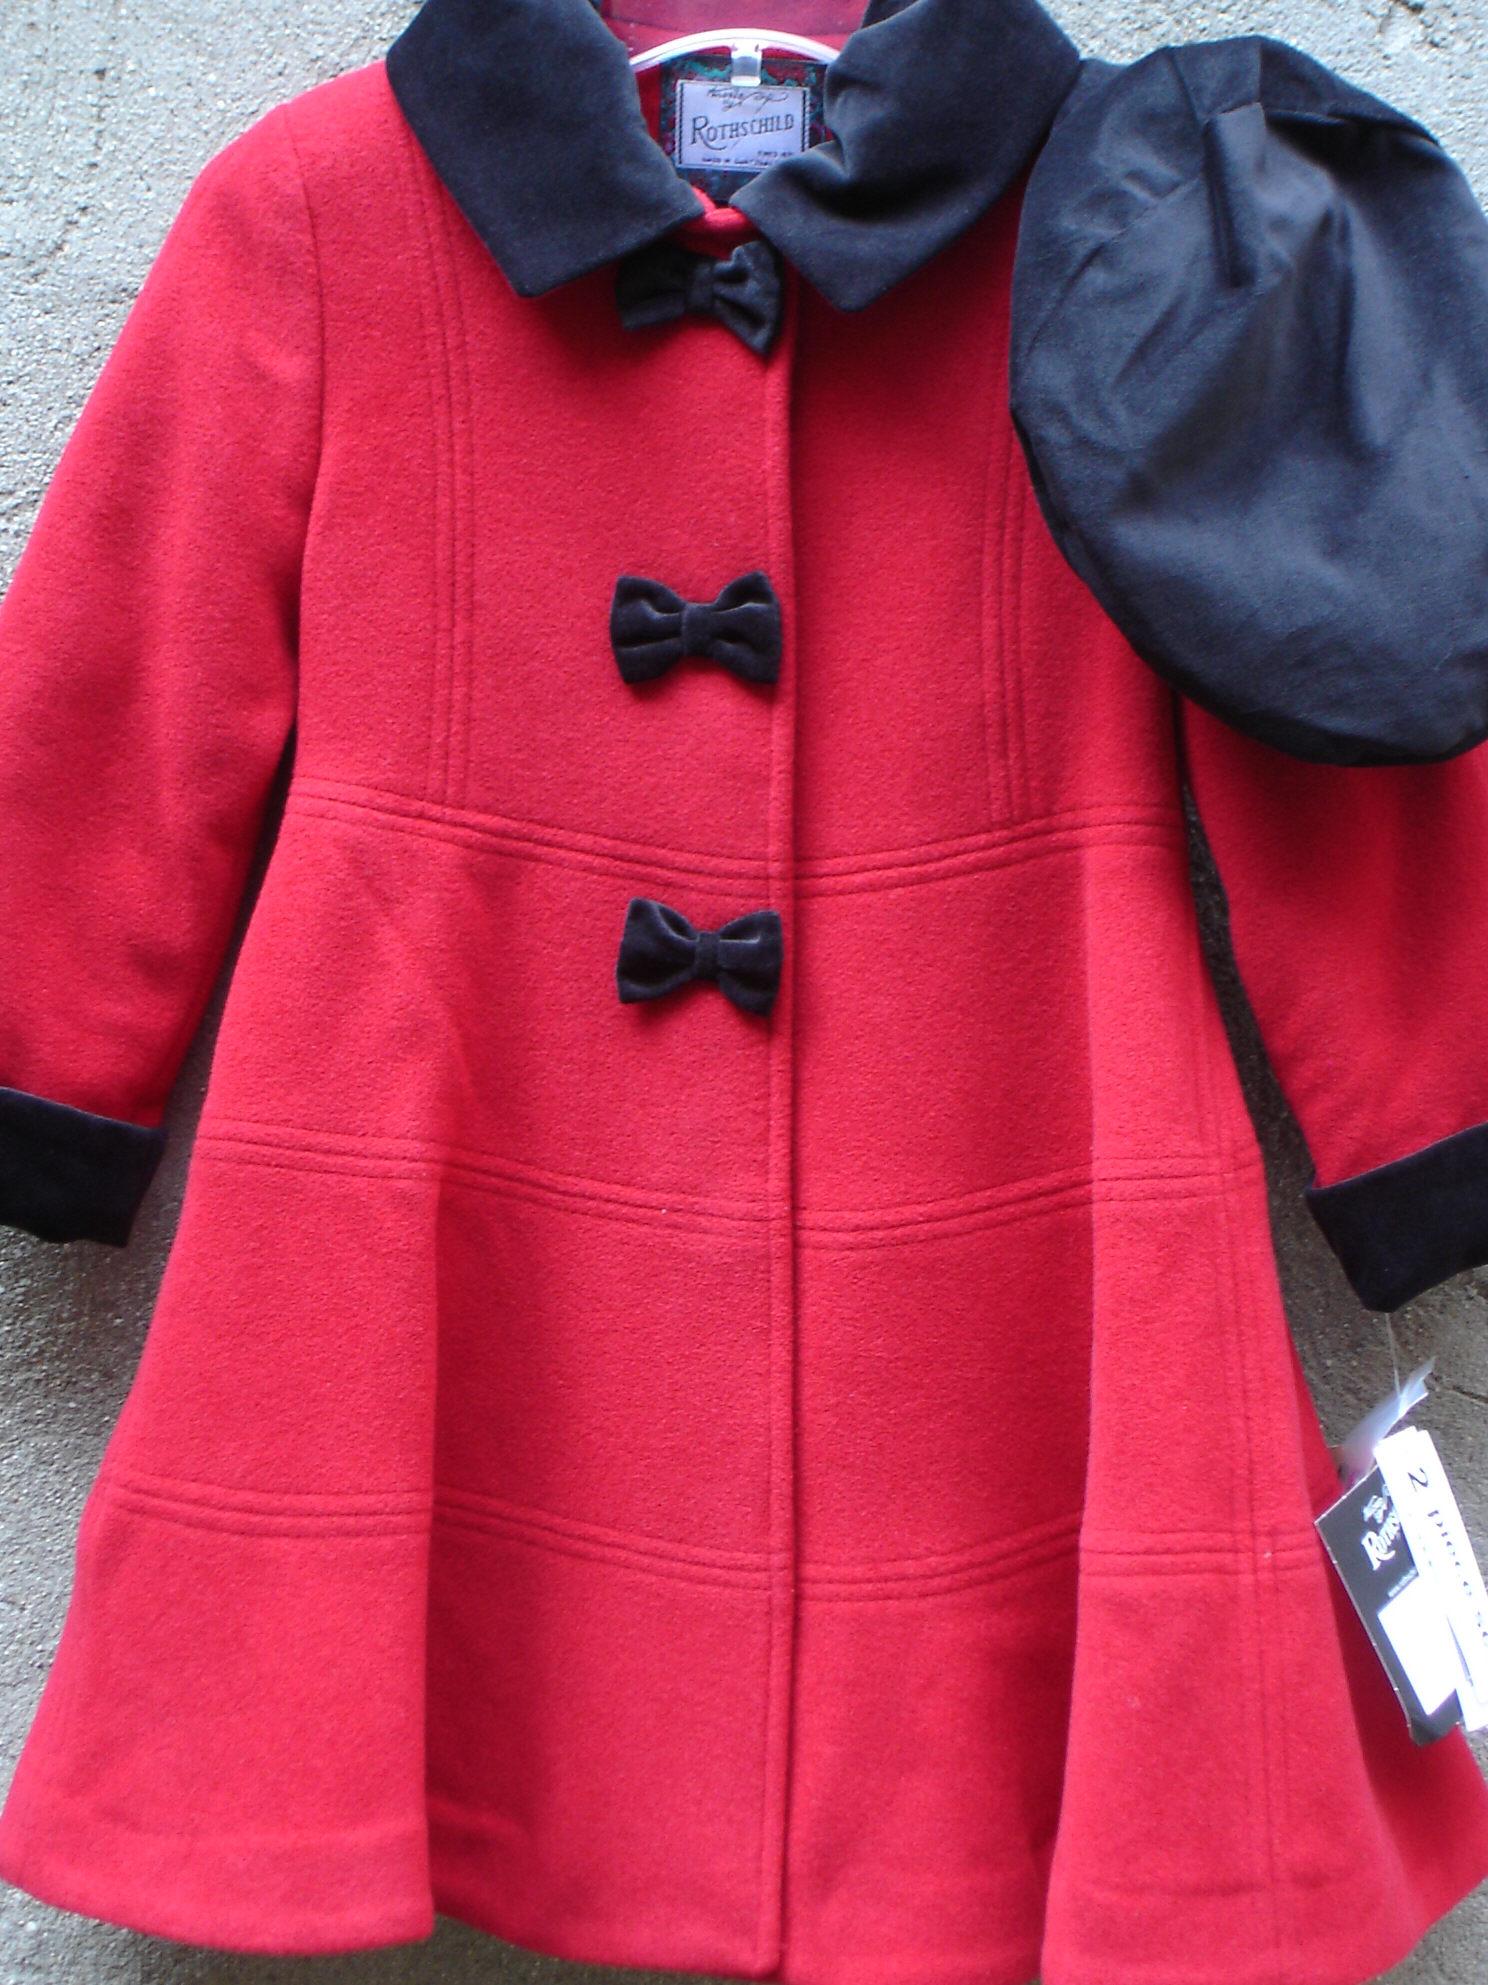 68d0e60d39ae Rothschild Coats